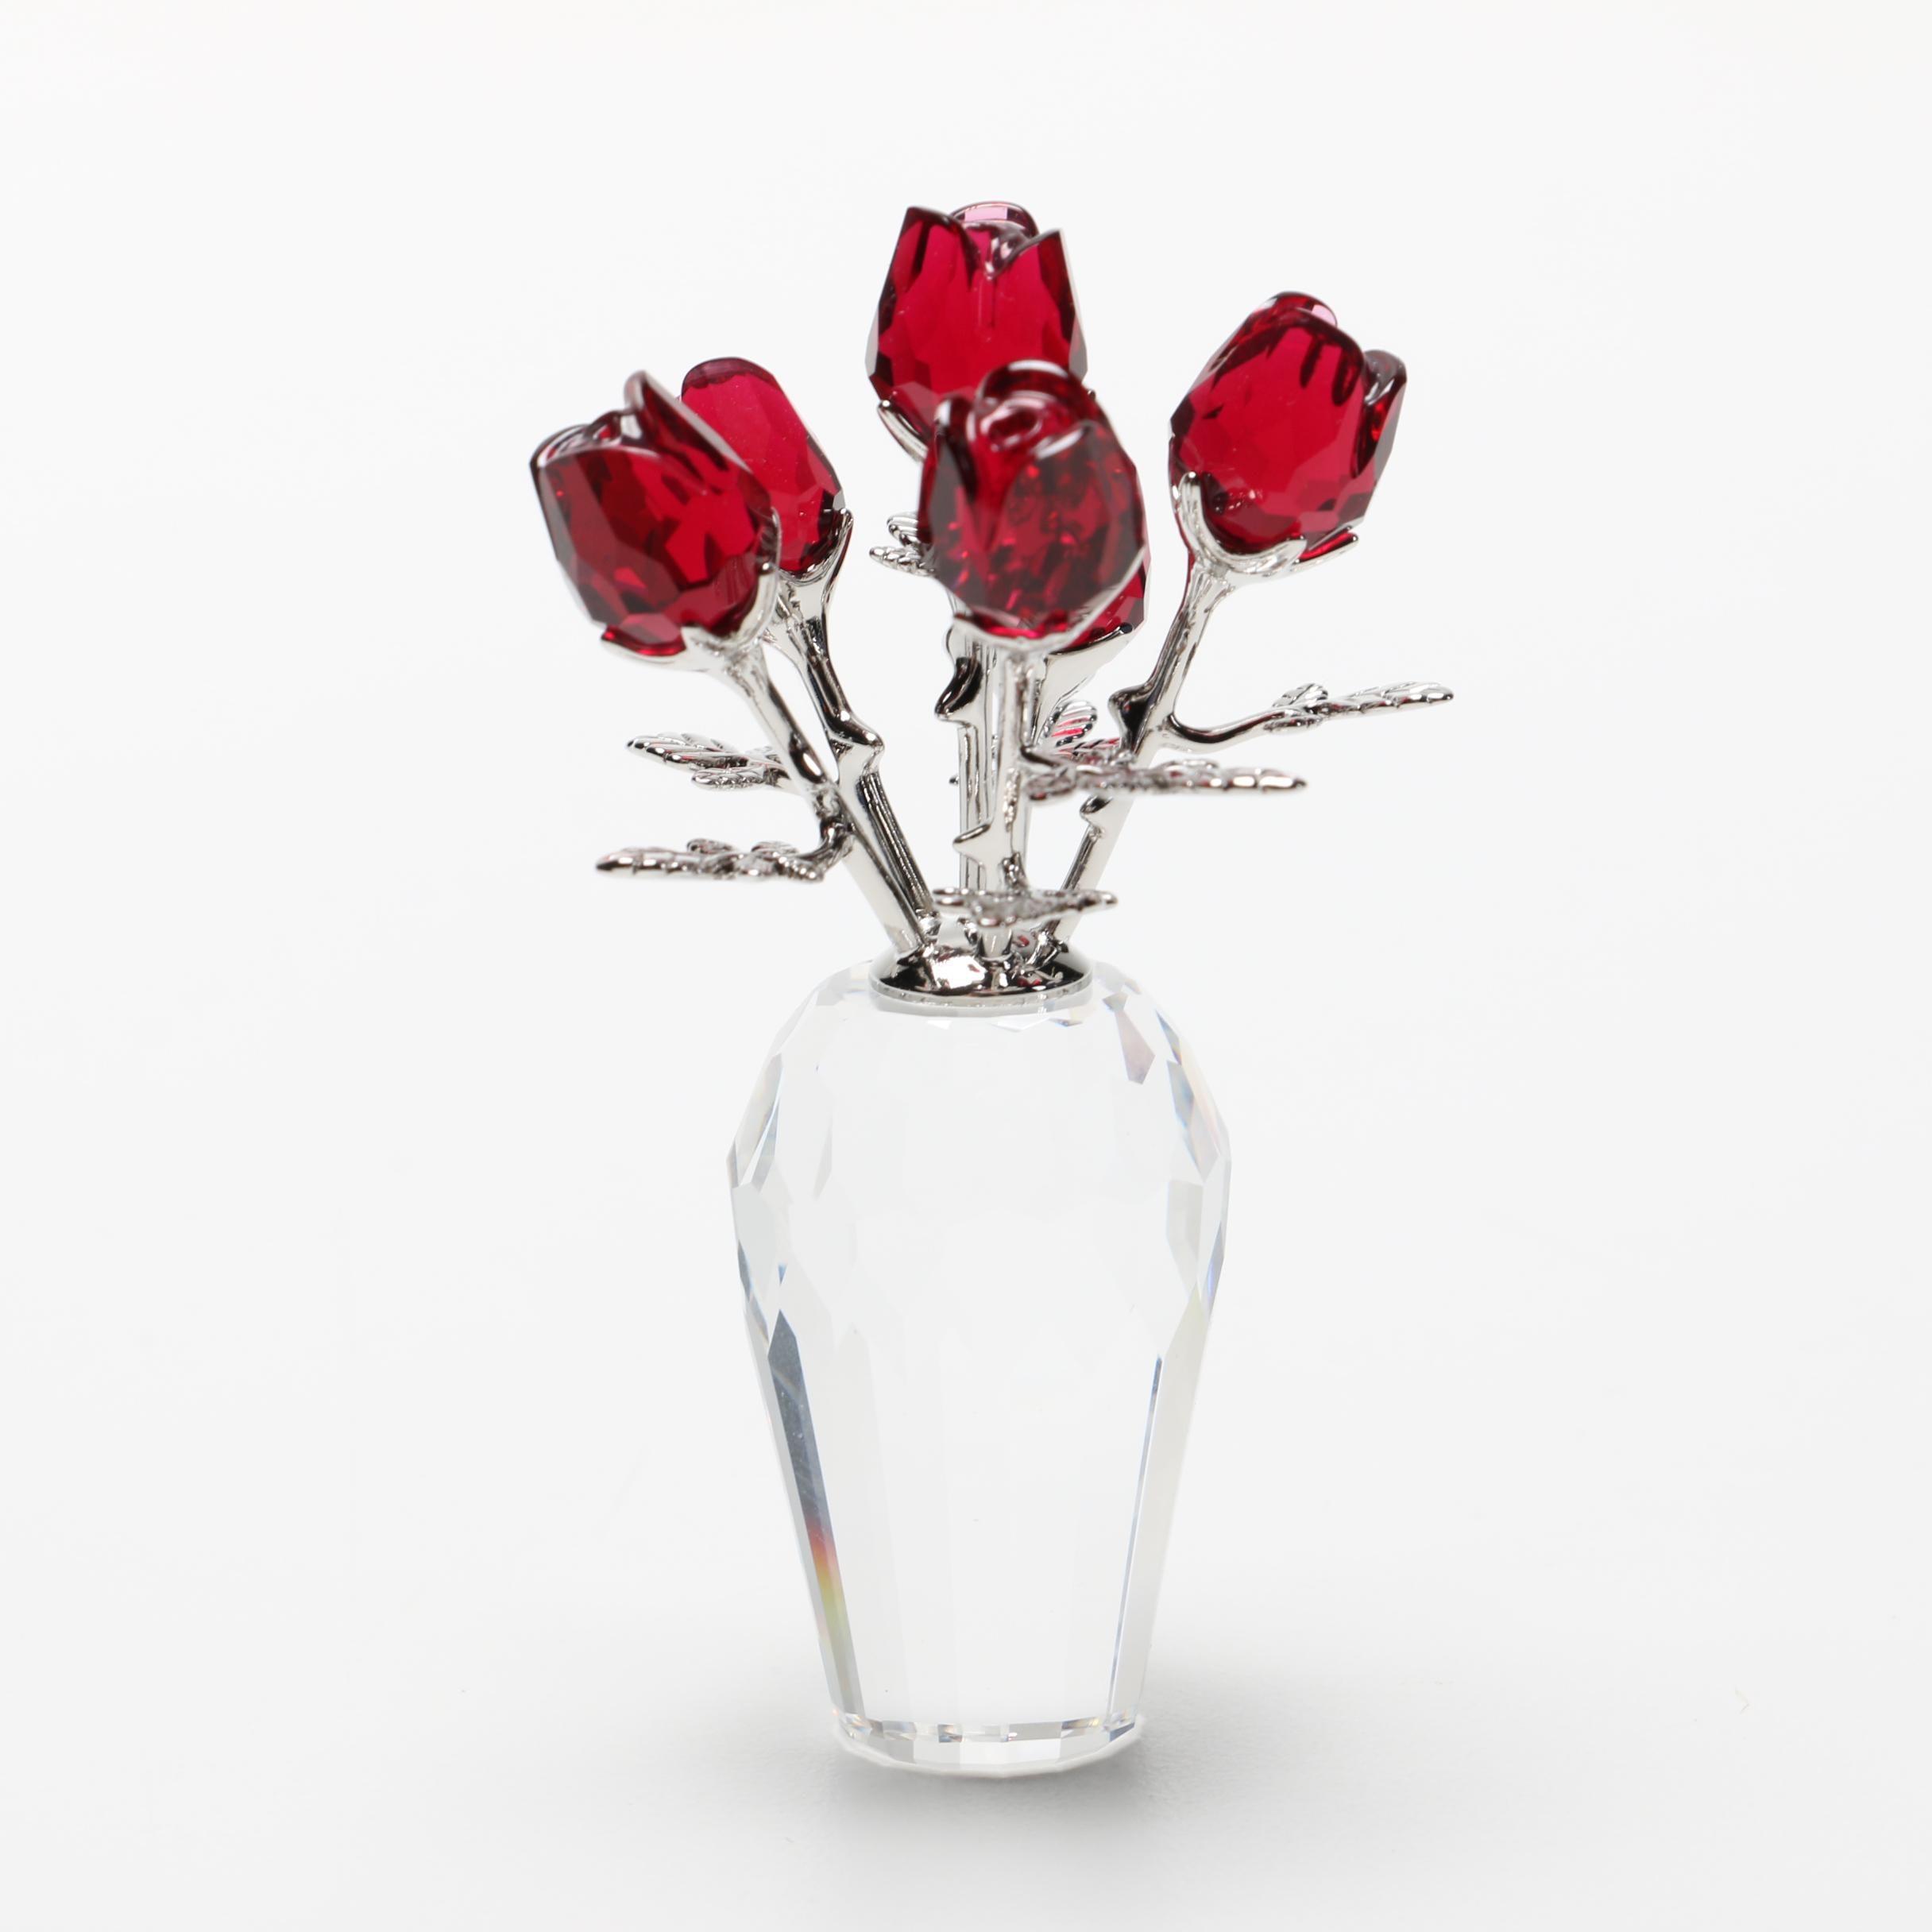 "Swarovski Crystal ""Flower Dreams"" Collection ""Vase of Roses"" Figurine"